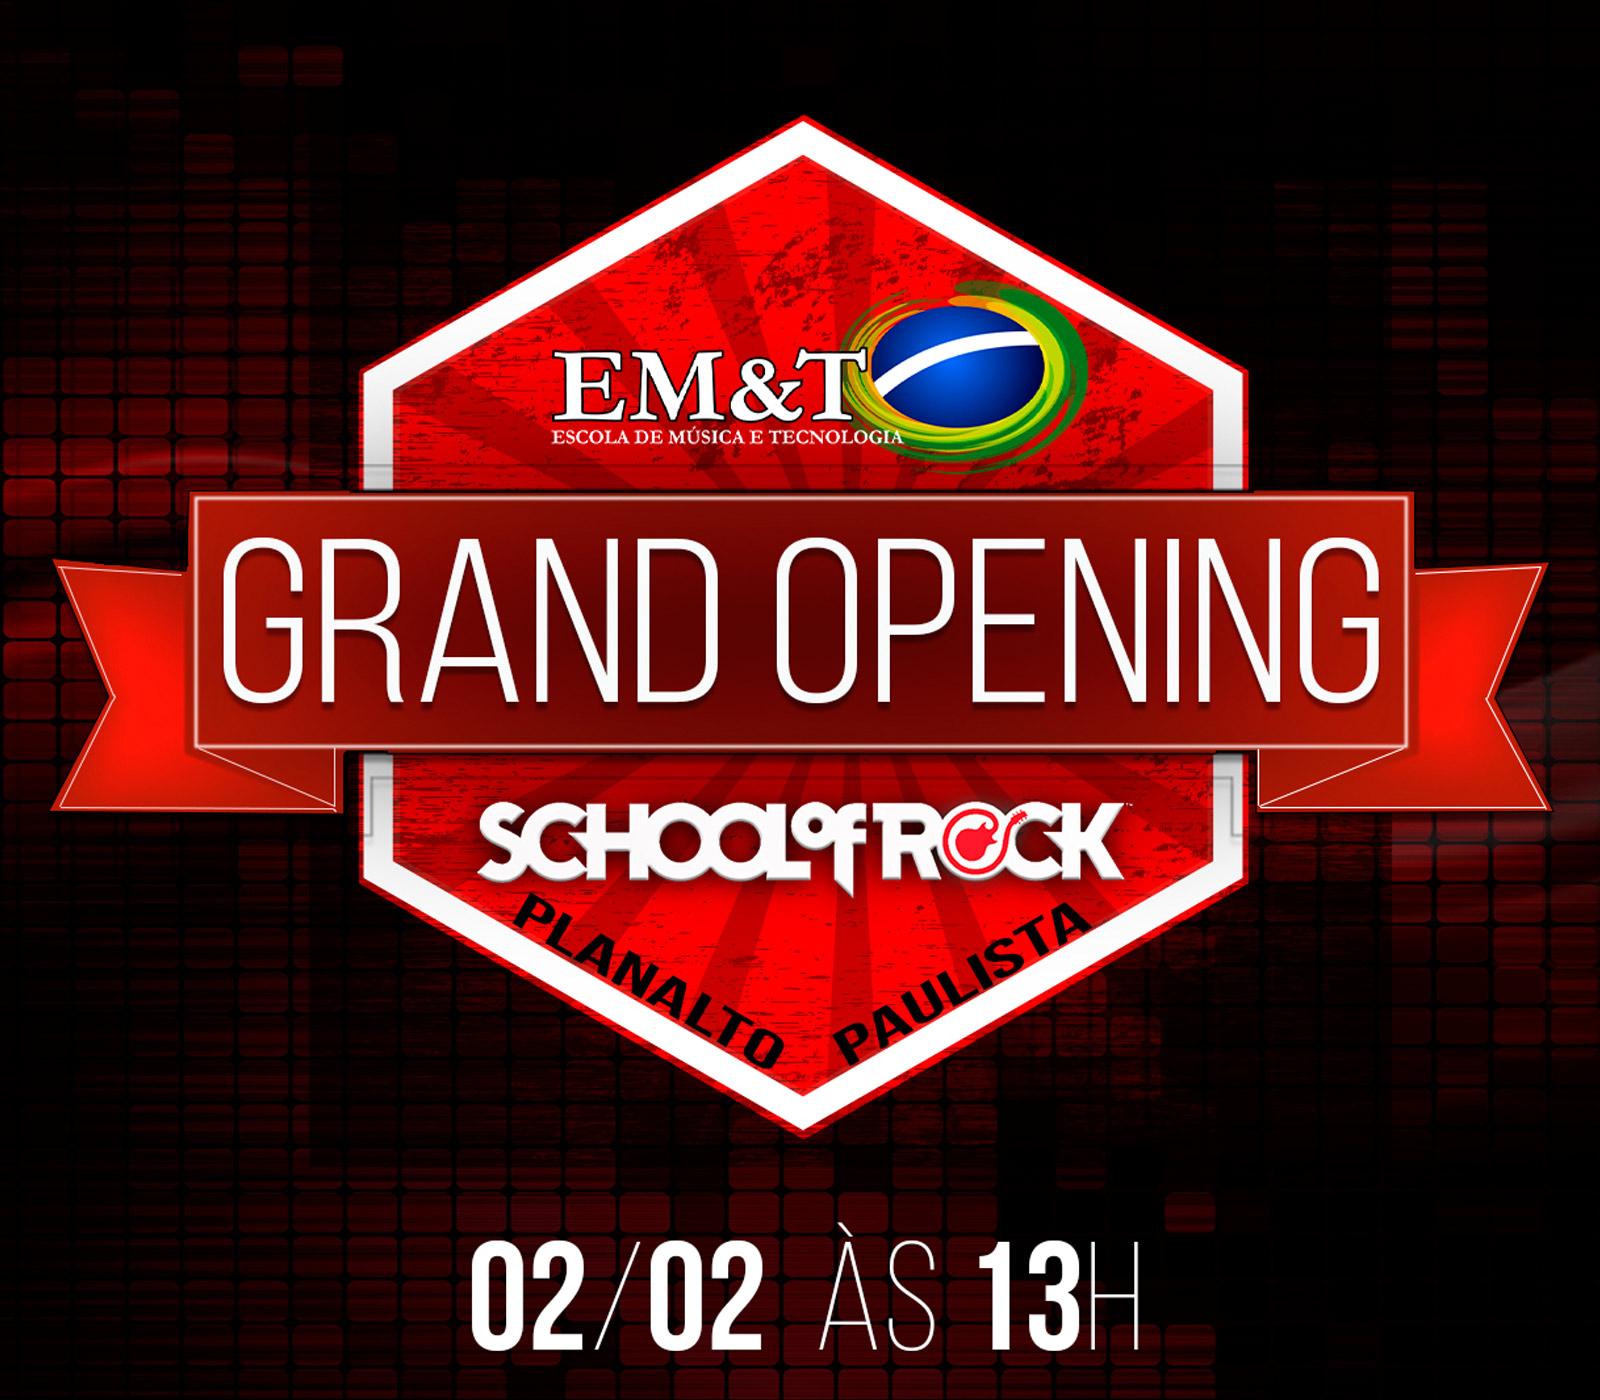 GRAND OPENING EM&T SCHOOL OF ROCK – Planalto Paulista